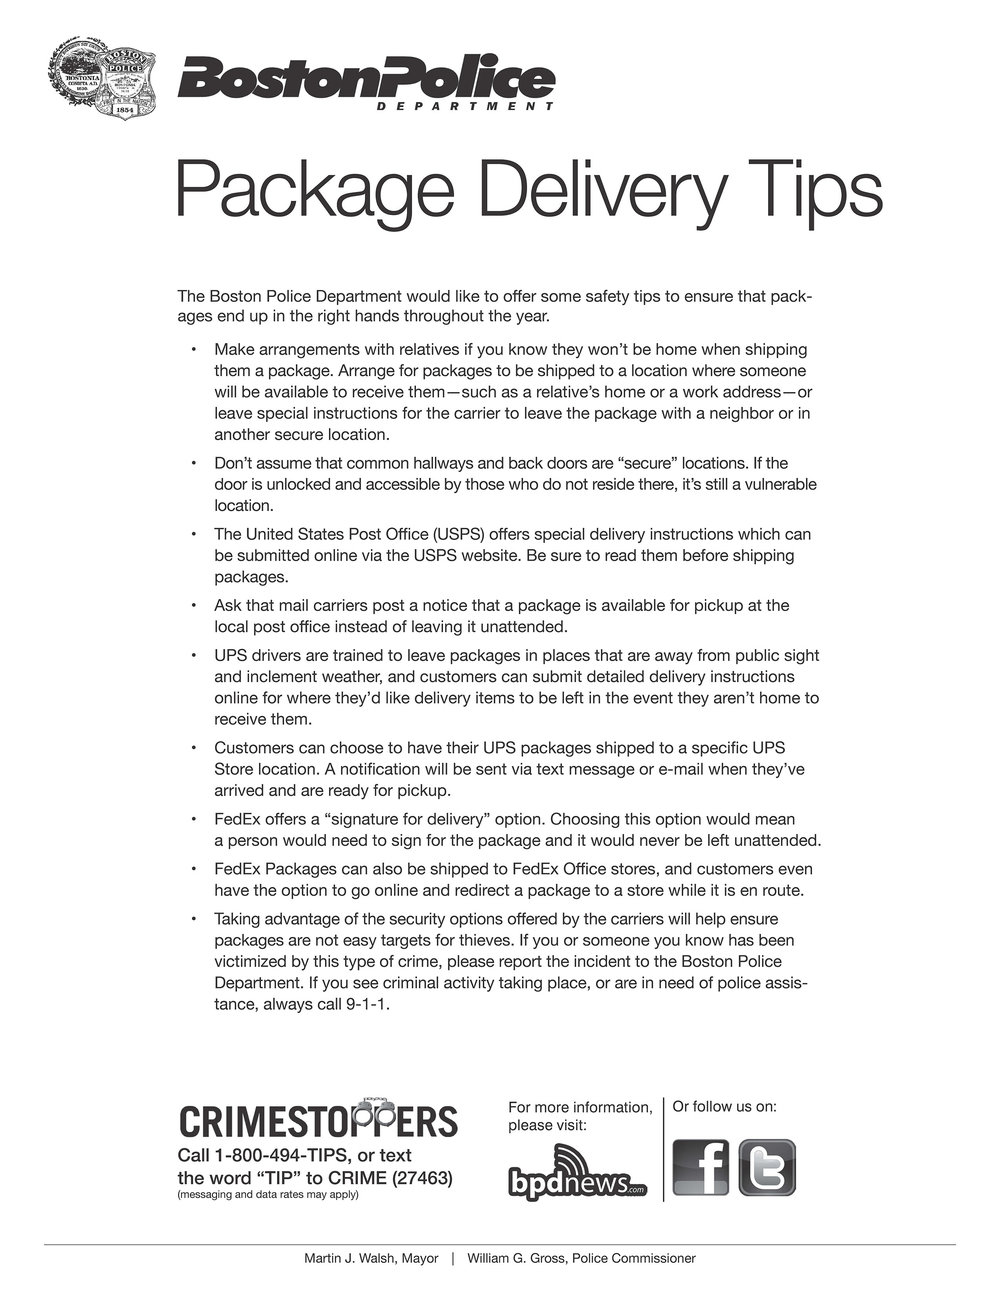 Package theft_BPD_2018.jpg